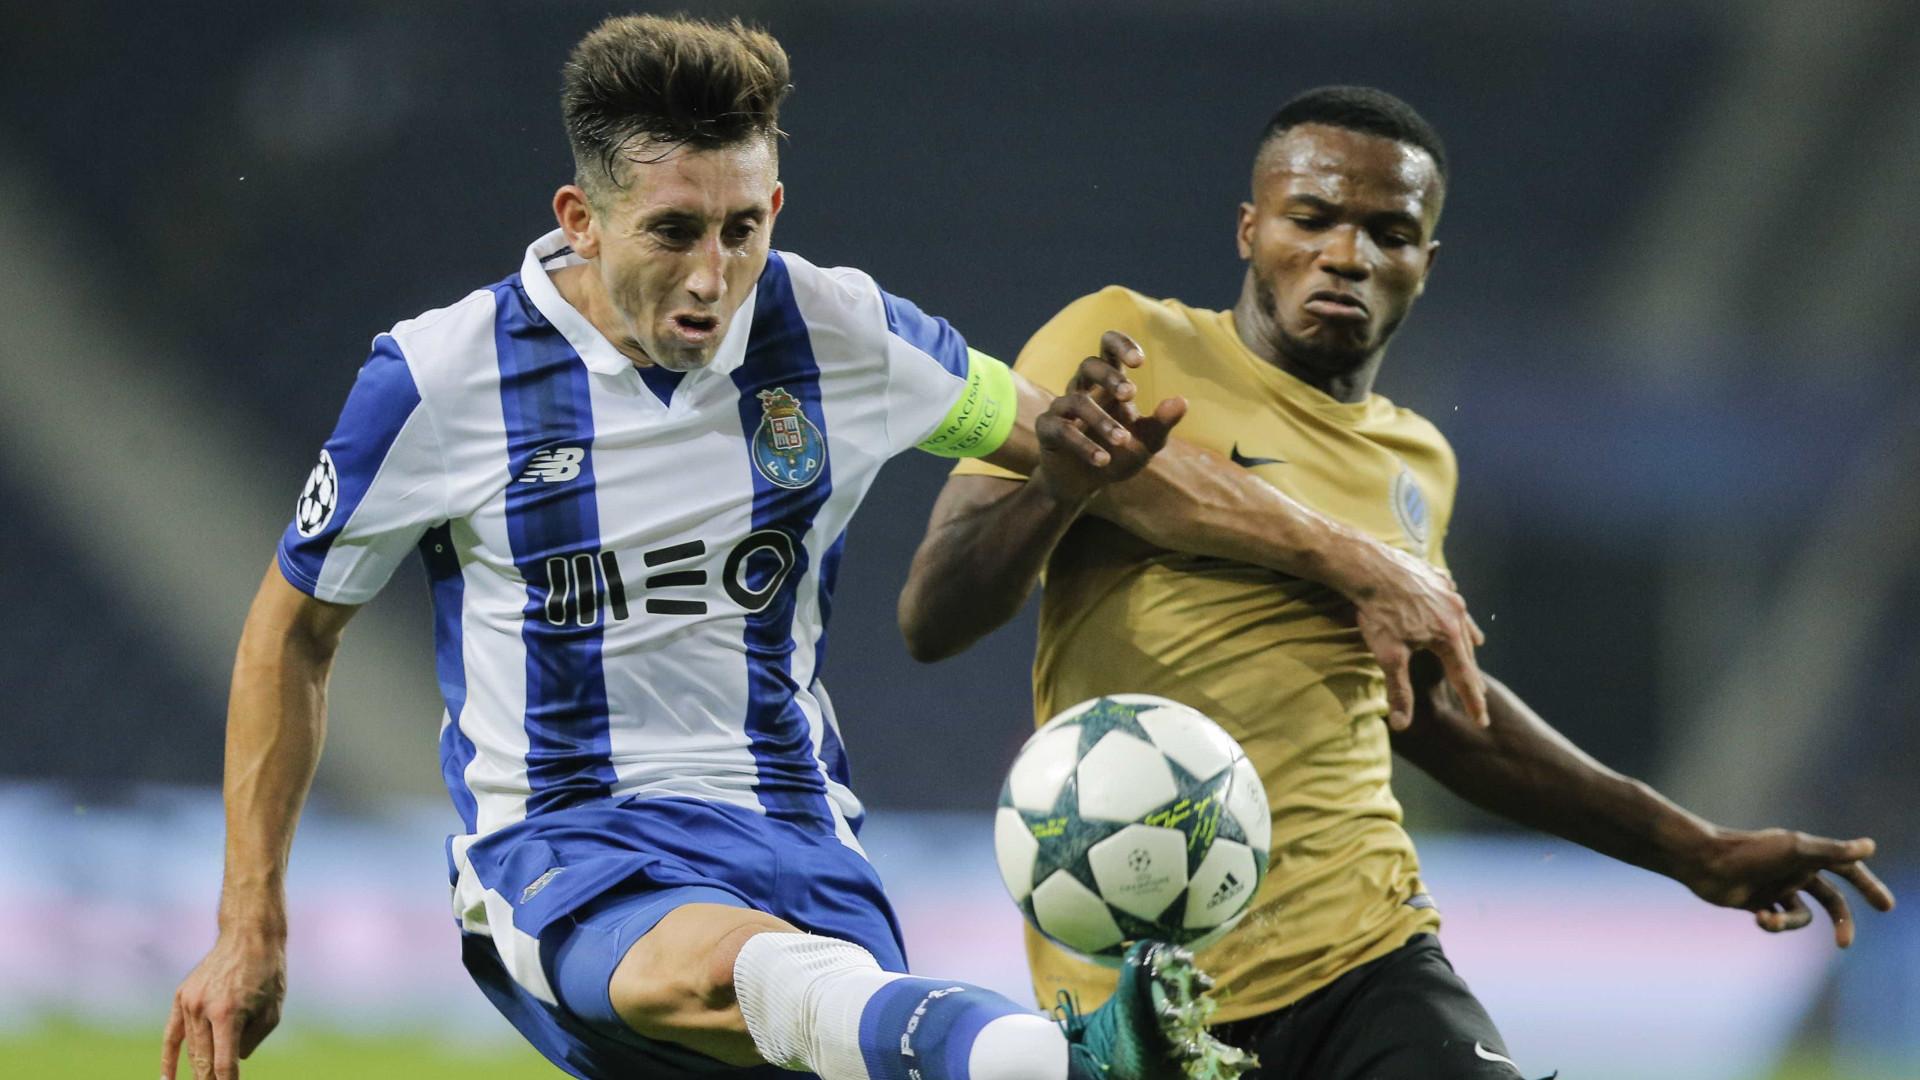 Herrera regressa aos treinos do FC Porto